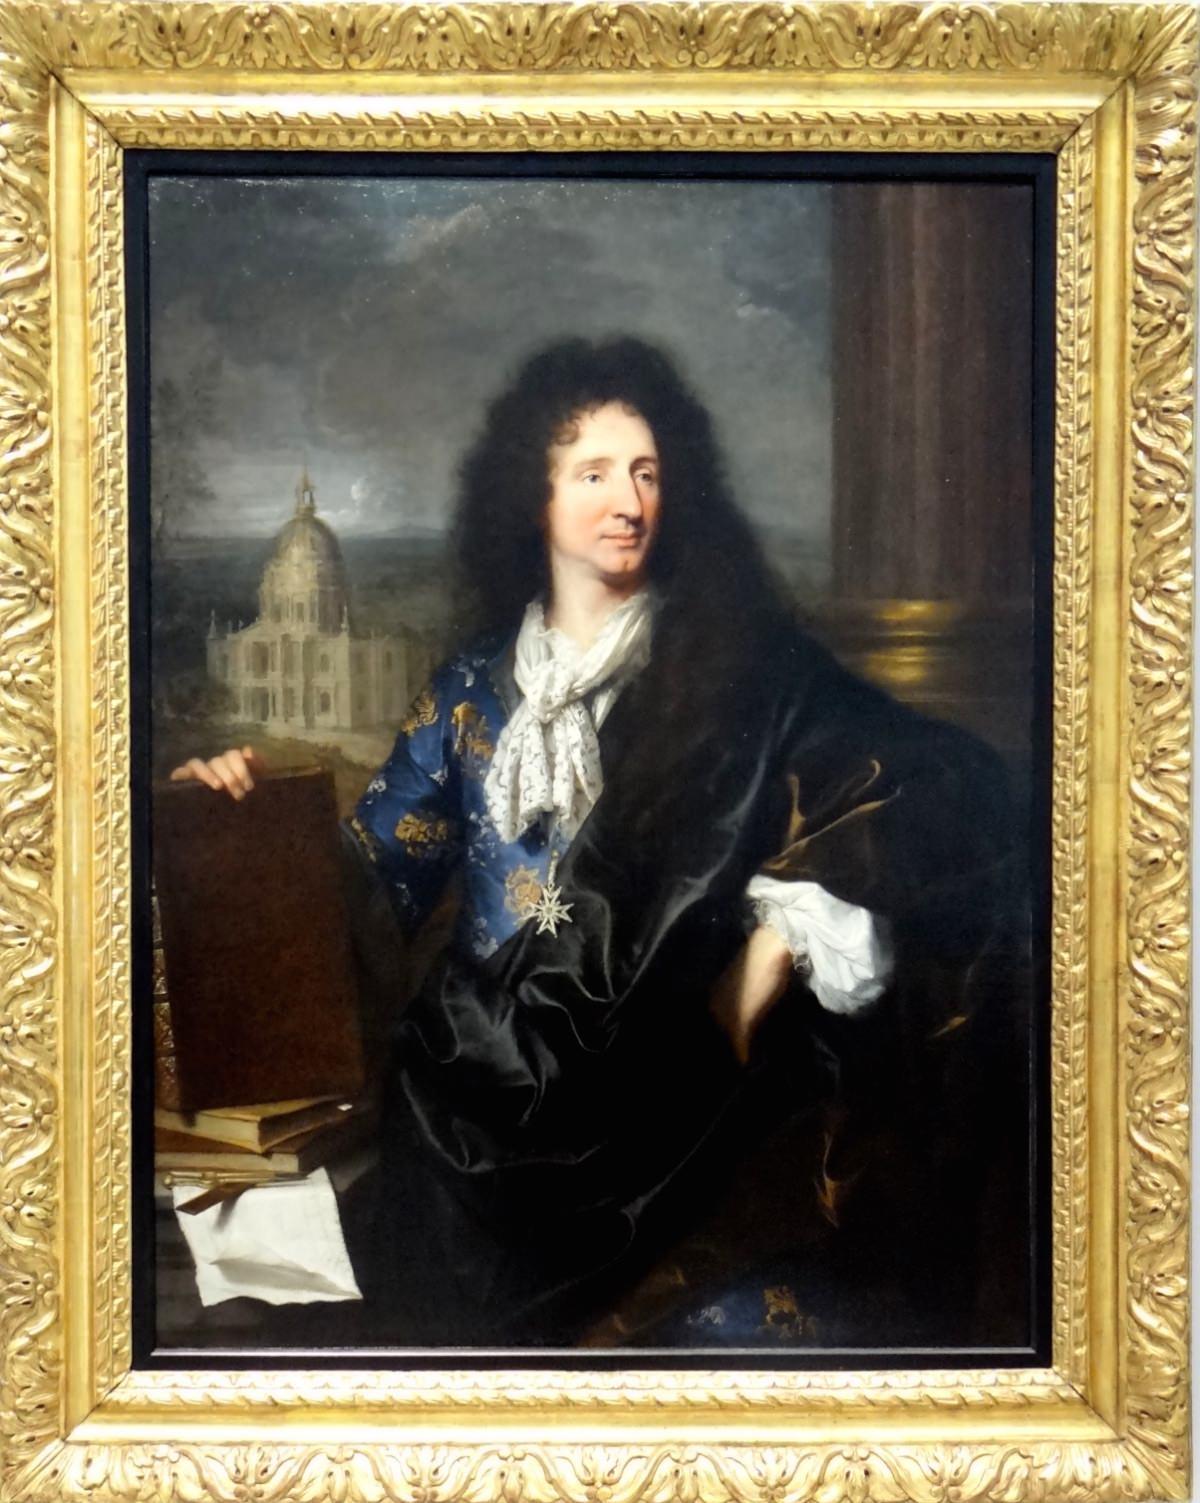 Hyacinthe Rigaud - 1685 Jules-Hardouin Mansart